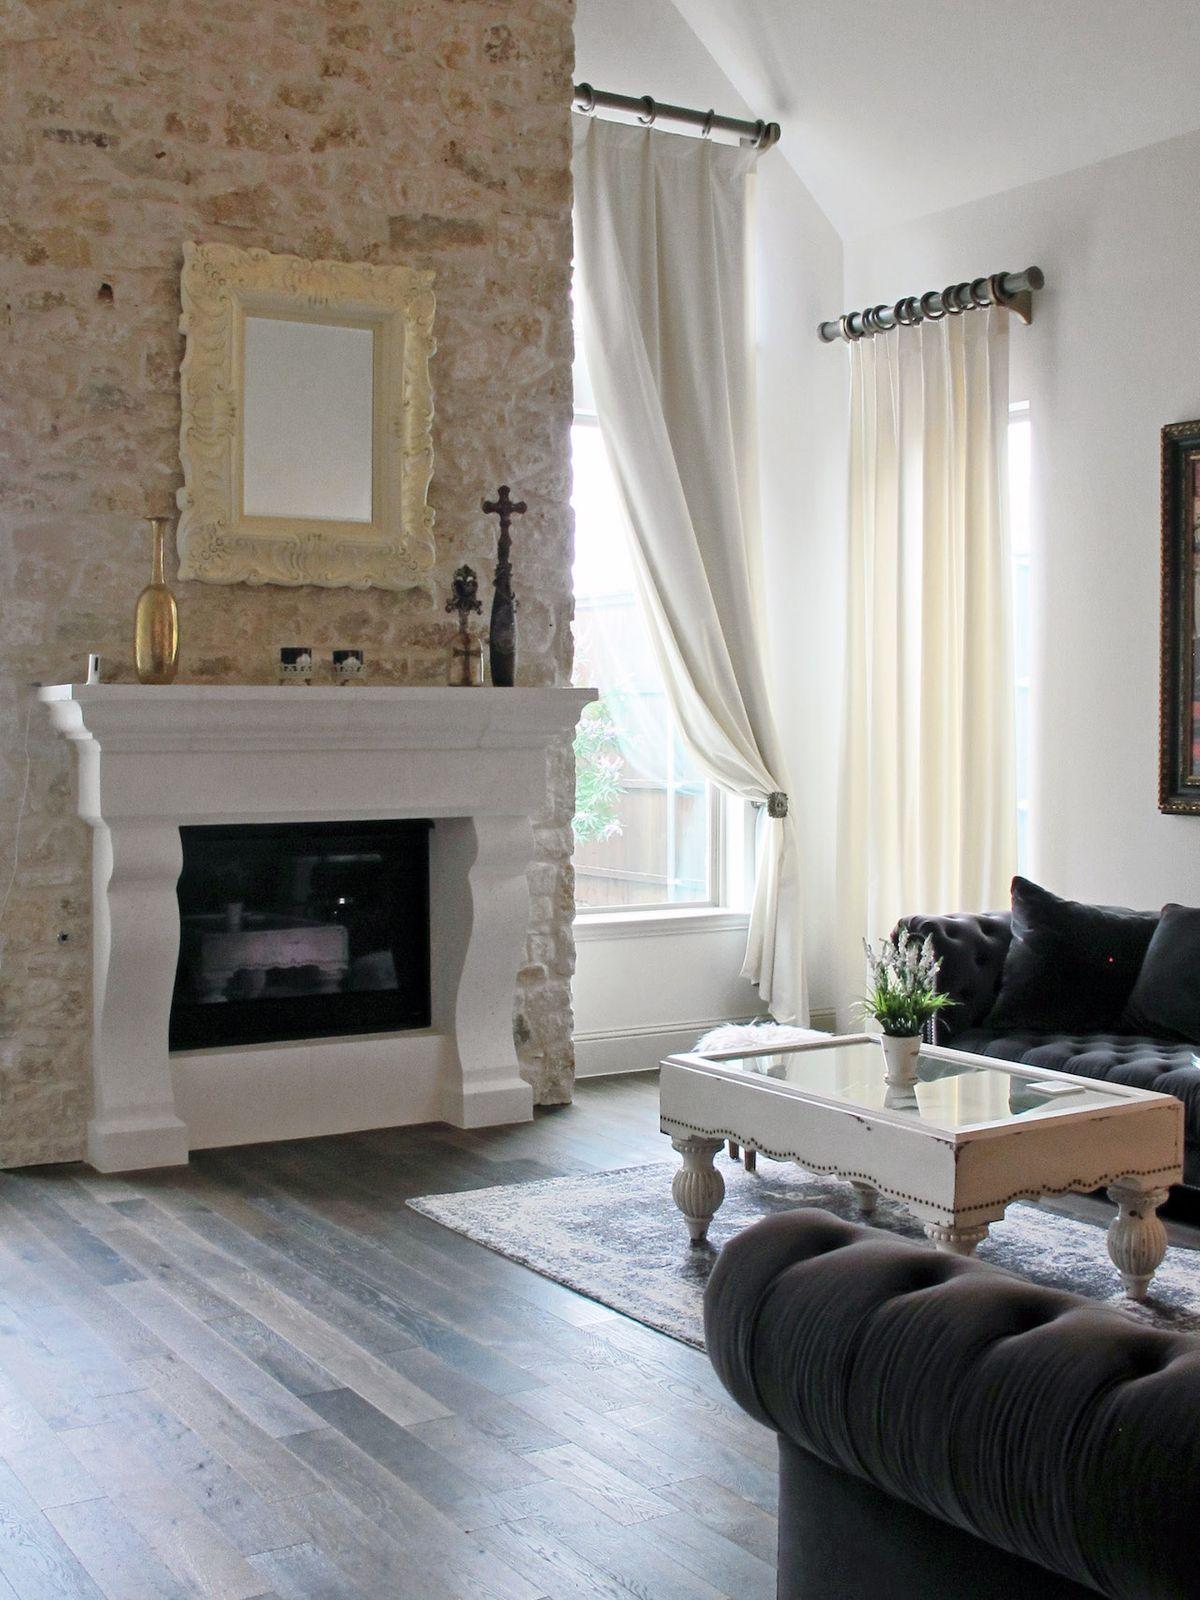 Calisto Way Traditional Home Photo Video Shoot Location Dallas